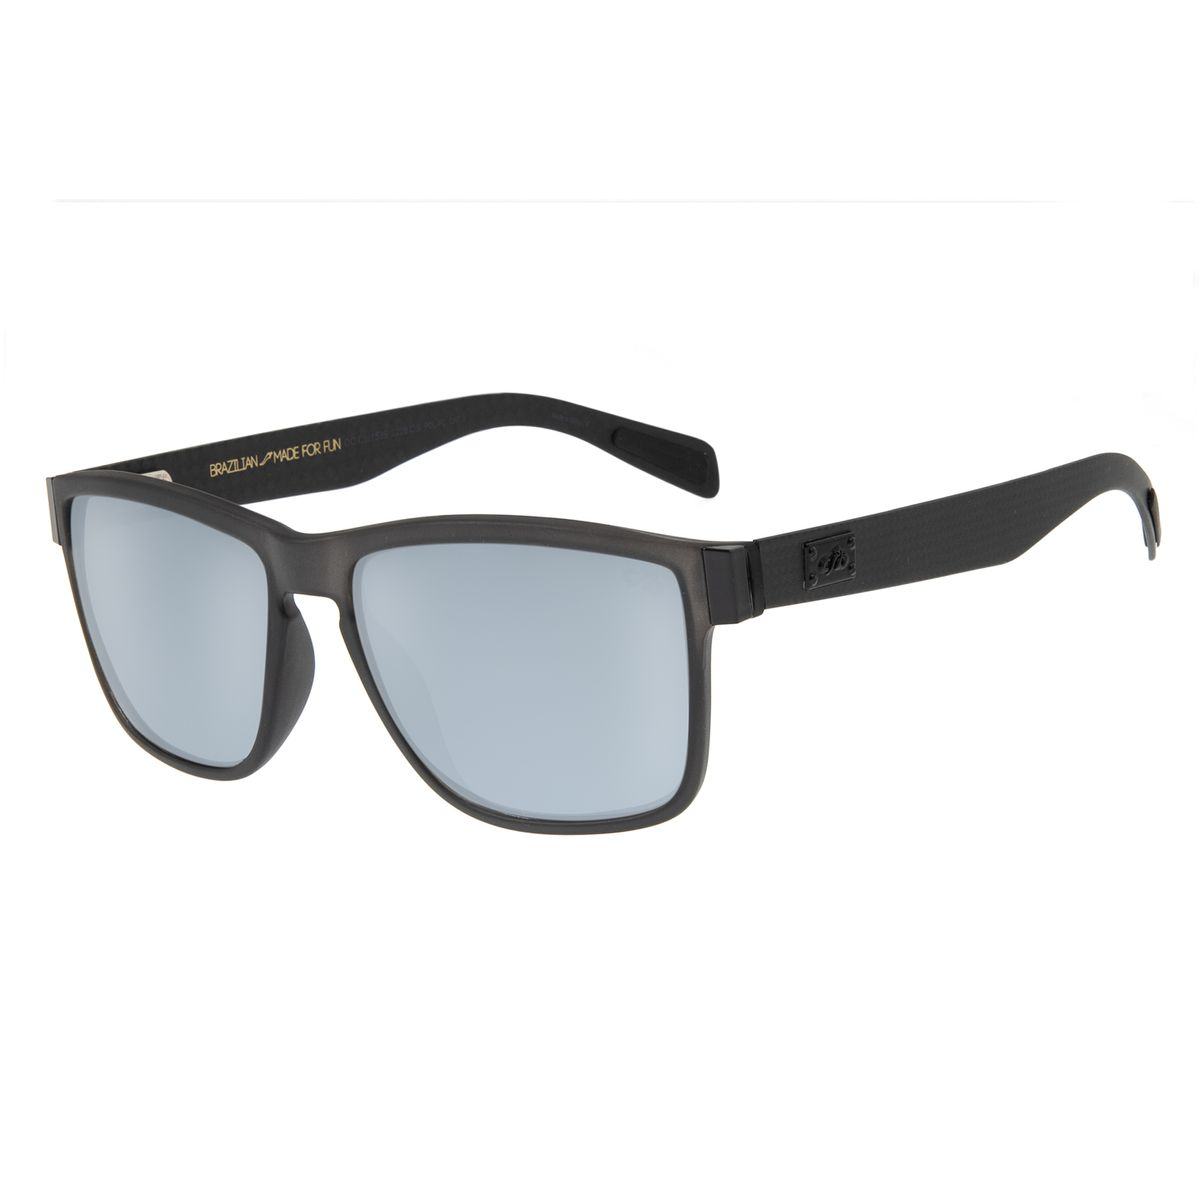 fbdd3e13a Óculos de Sol Masculino Chilli Beans Quadrado Cinza Escuro Polarizado -  OC.CL.1539.3228 M. REF: OC.CL.1539.3228. OC.